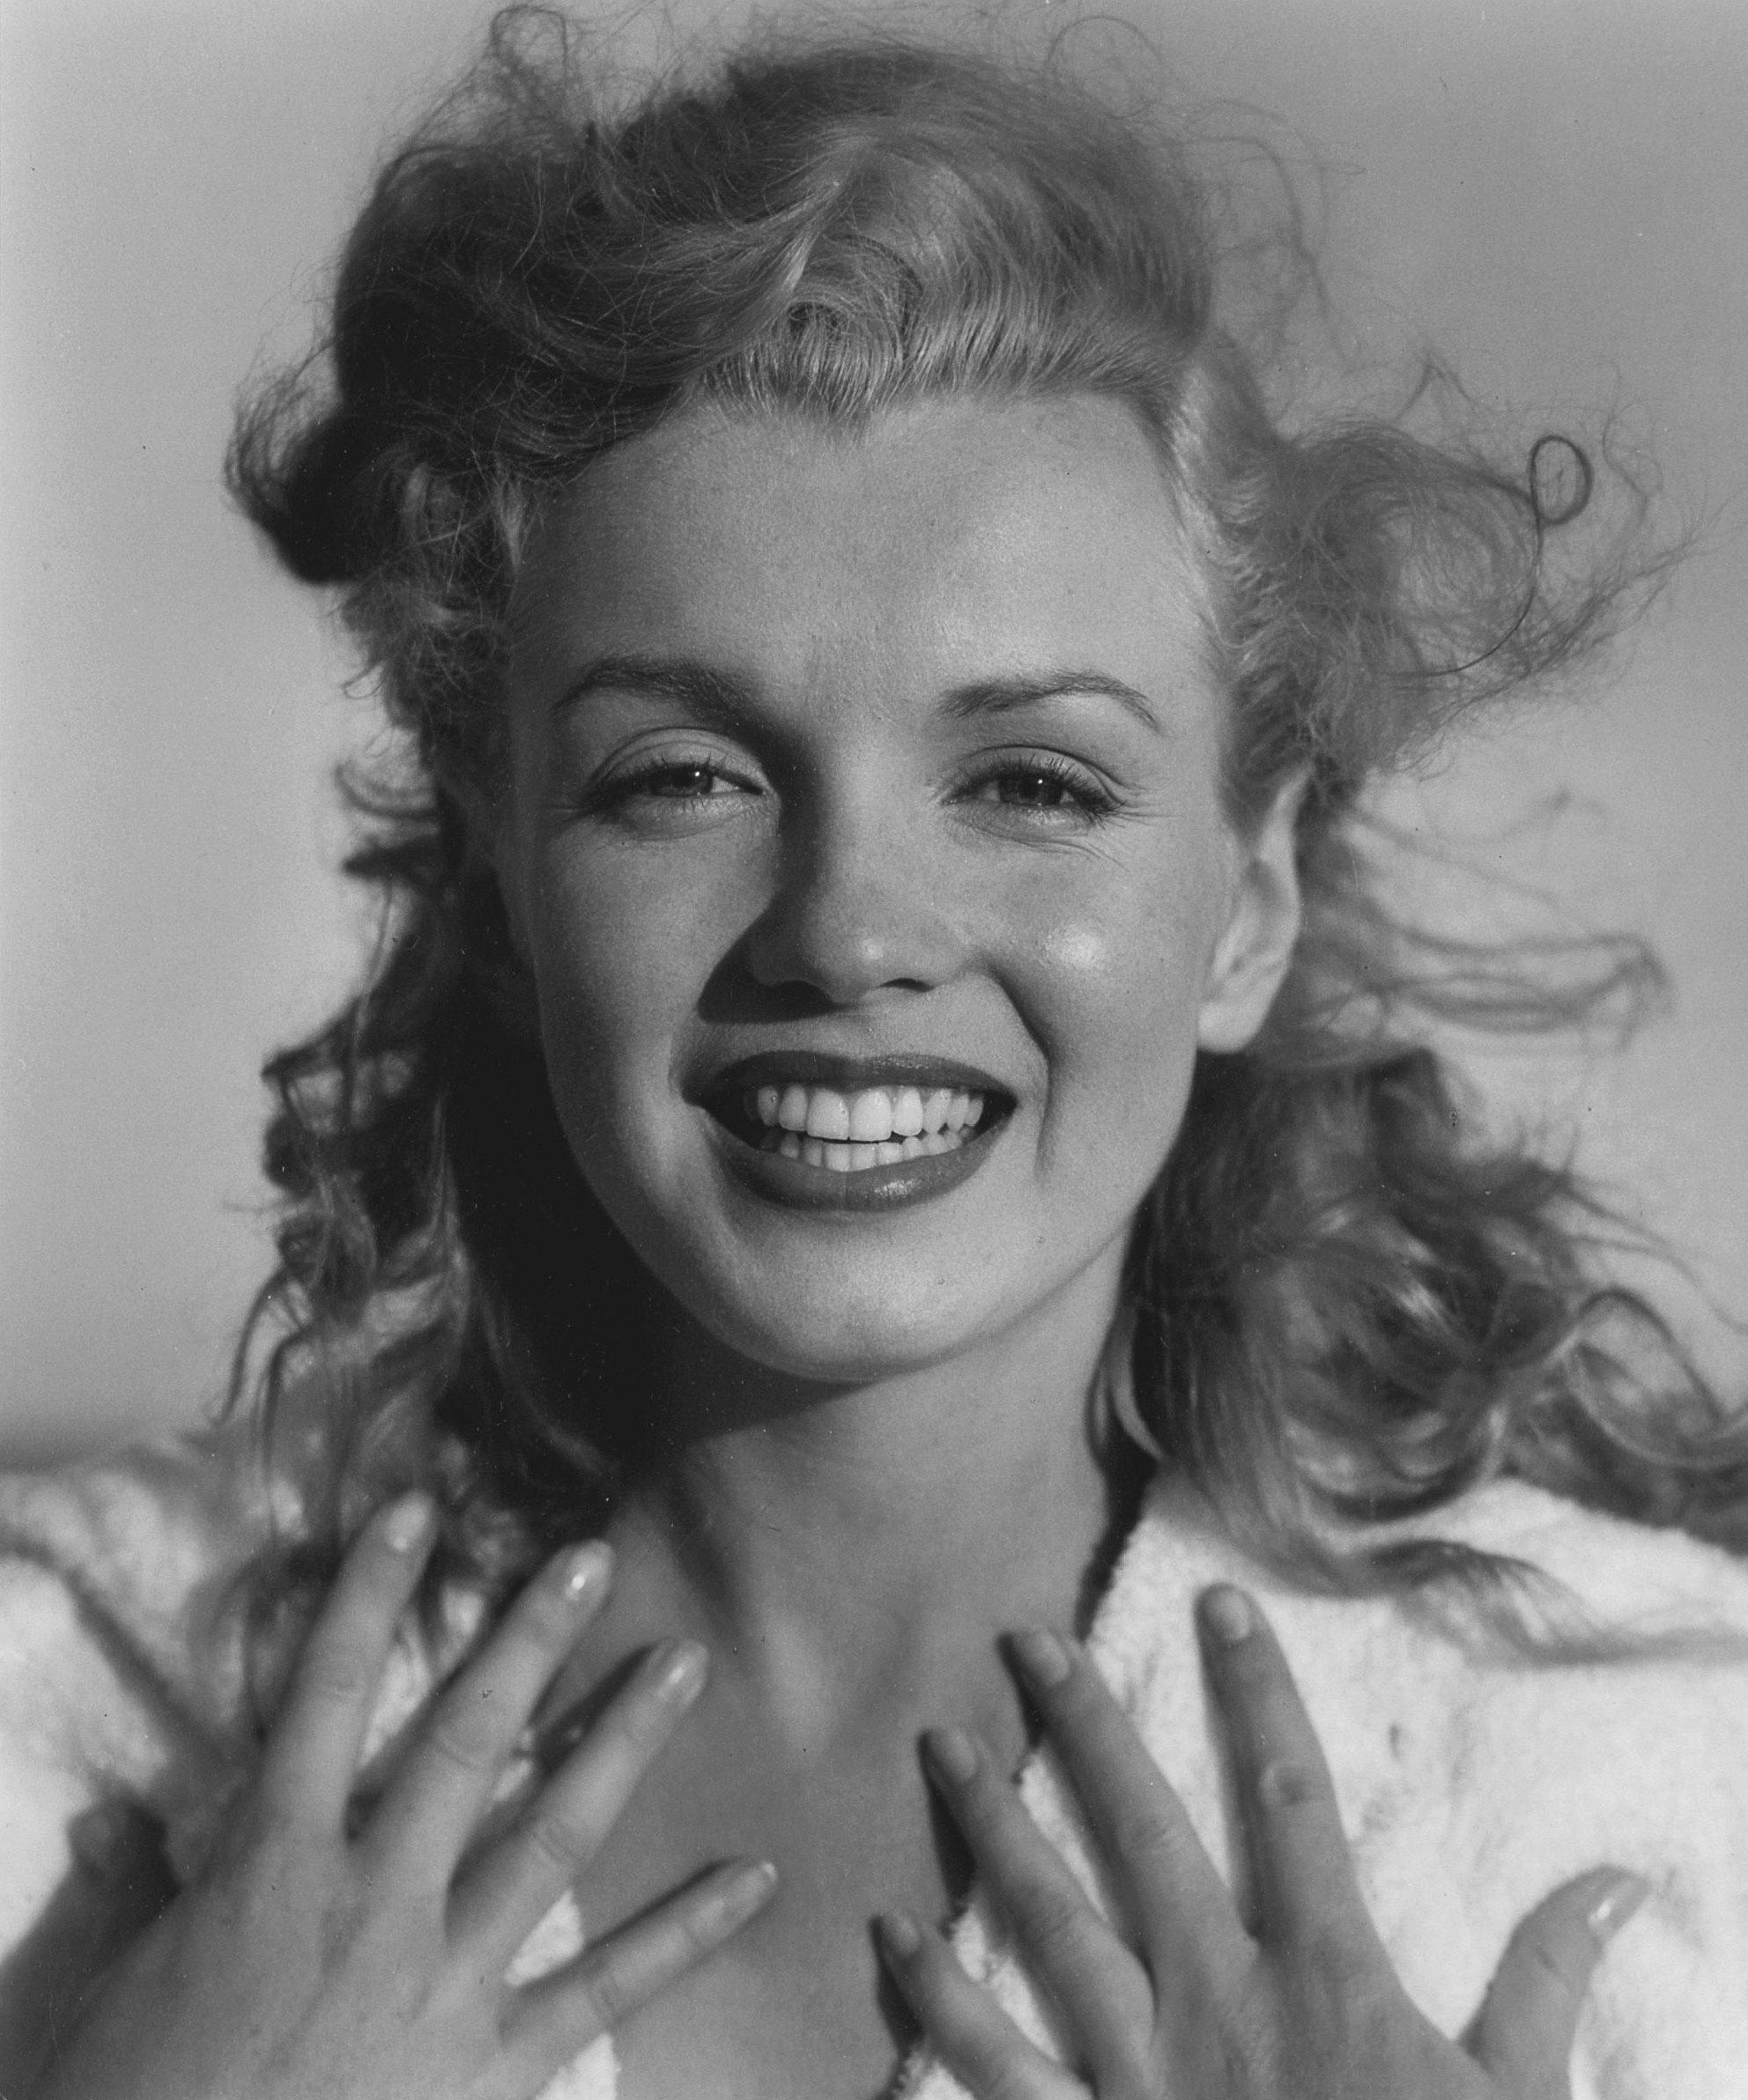 Marilyn Monroe By Andre De Dienes Toby Beach 1949 Morte De